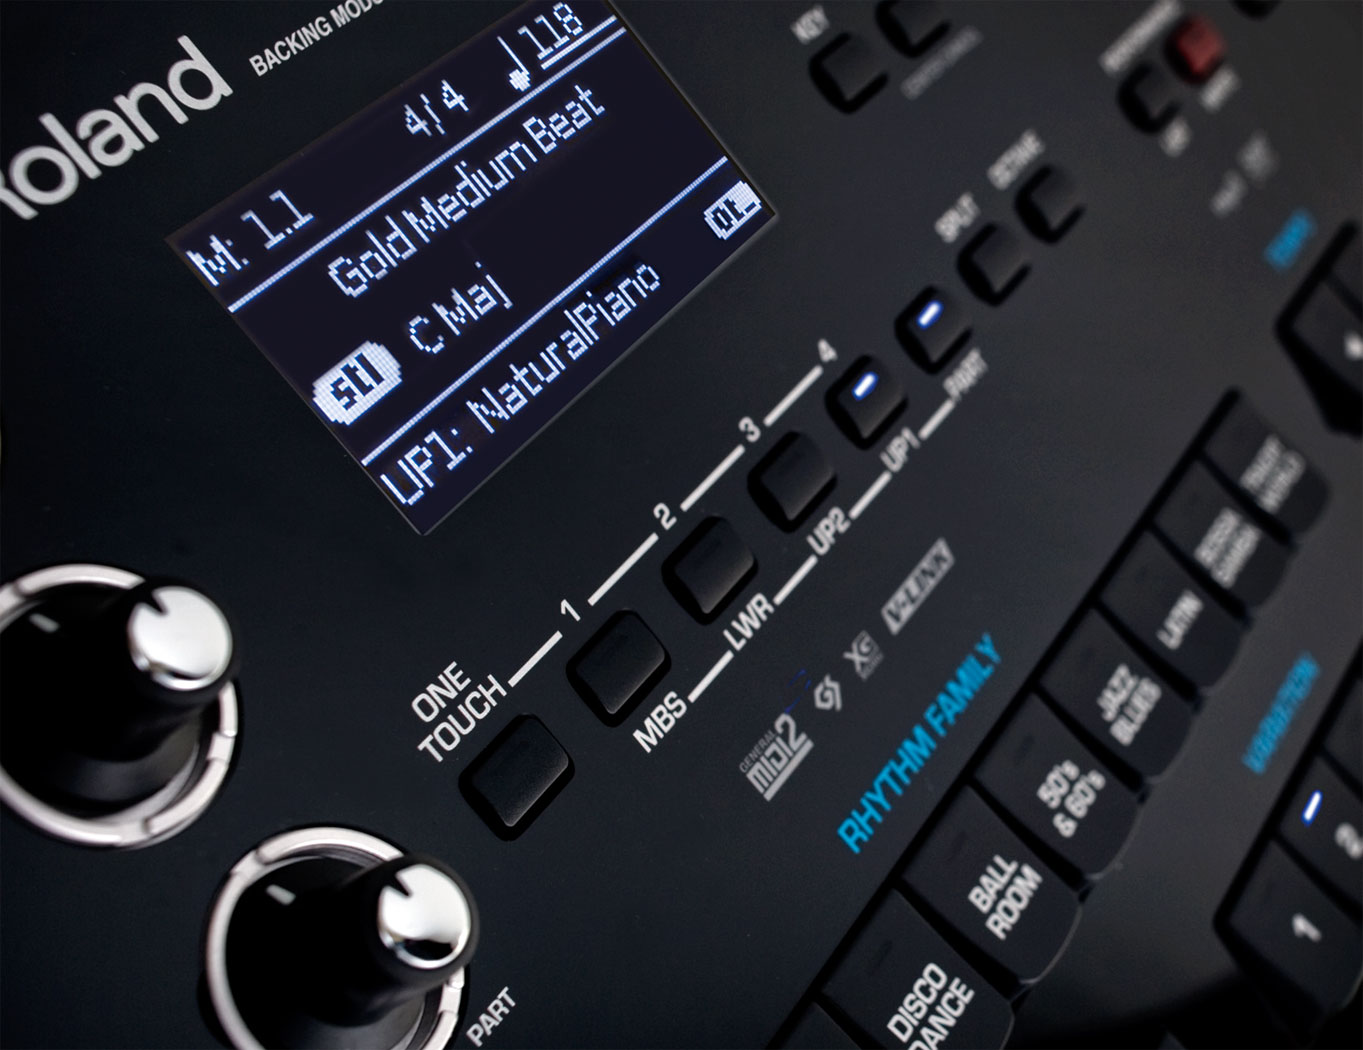 Roland - BK-7m | Backing Module